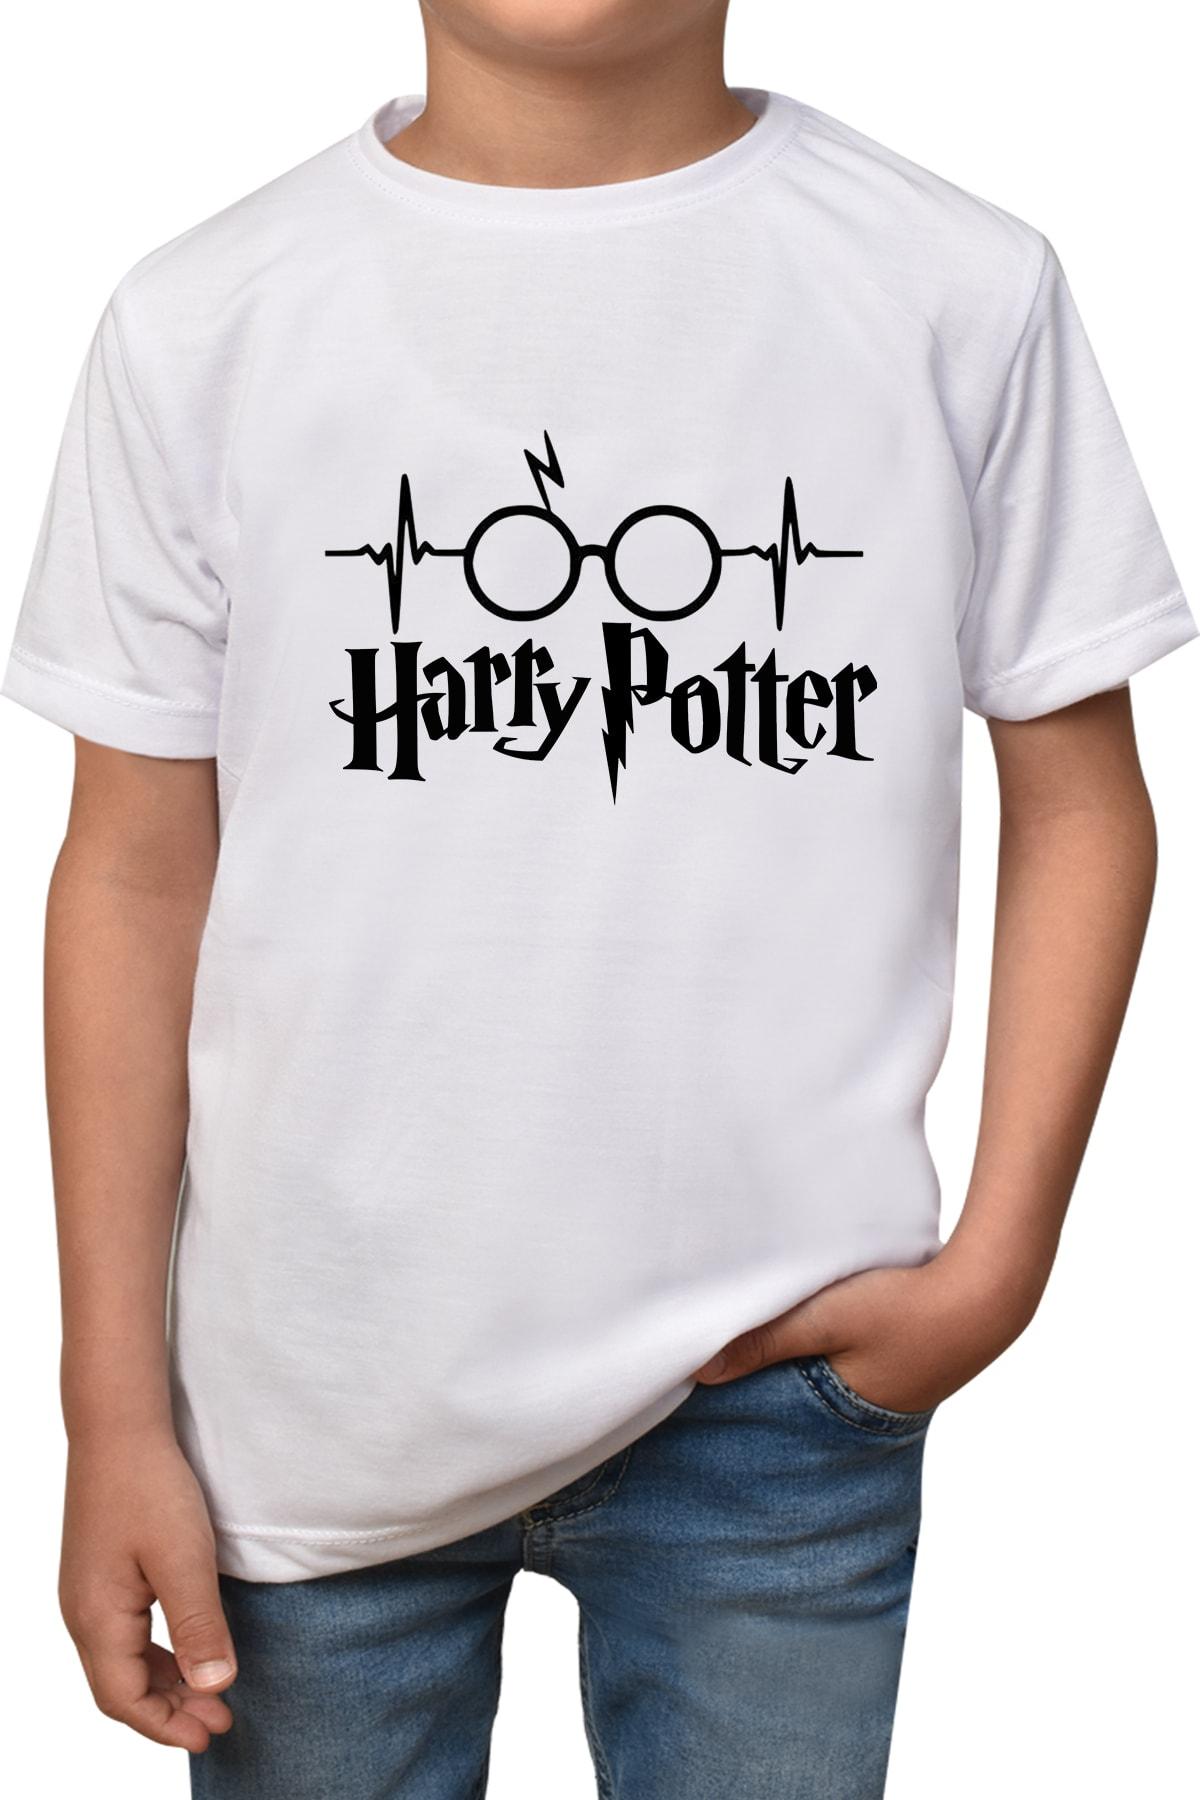 Phi Ajans Erkek ve Kız Çocuk Beyaz  Harry Potter T-shirt T-52 1